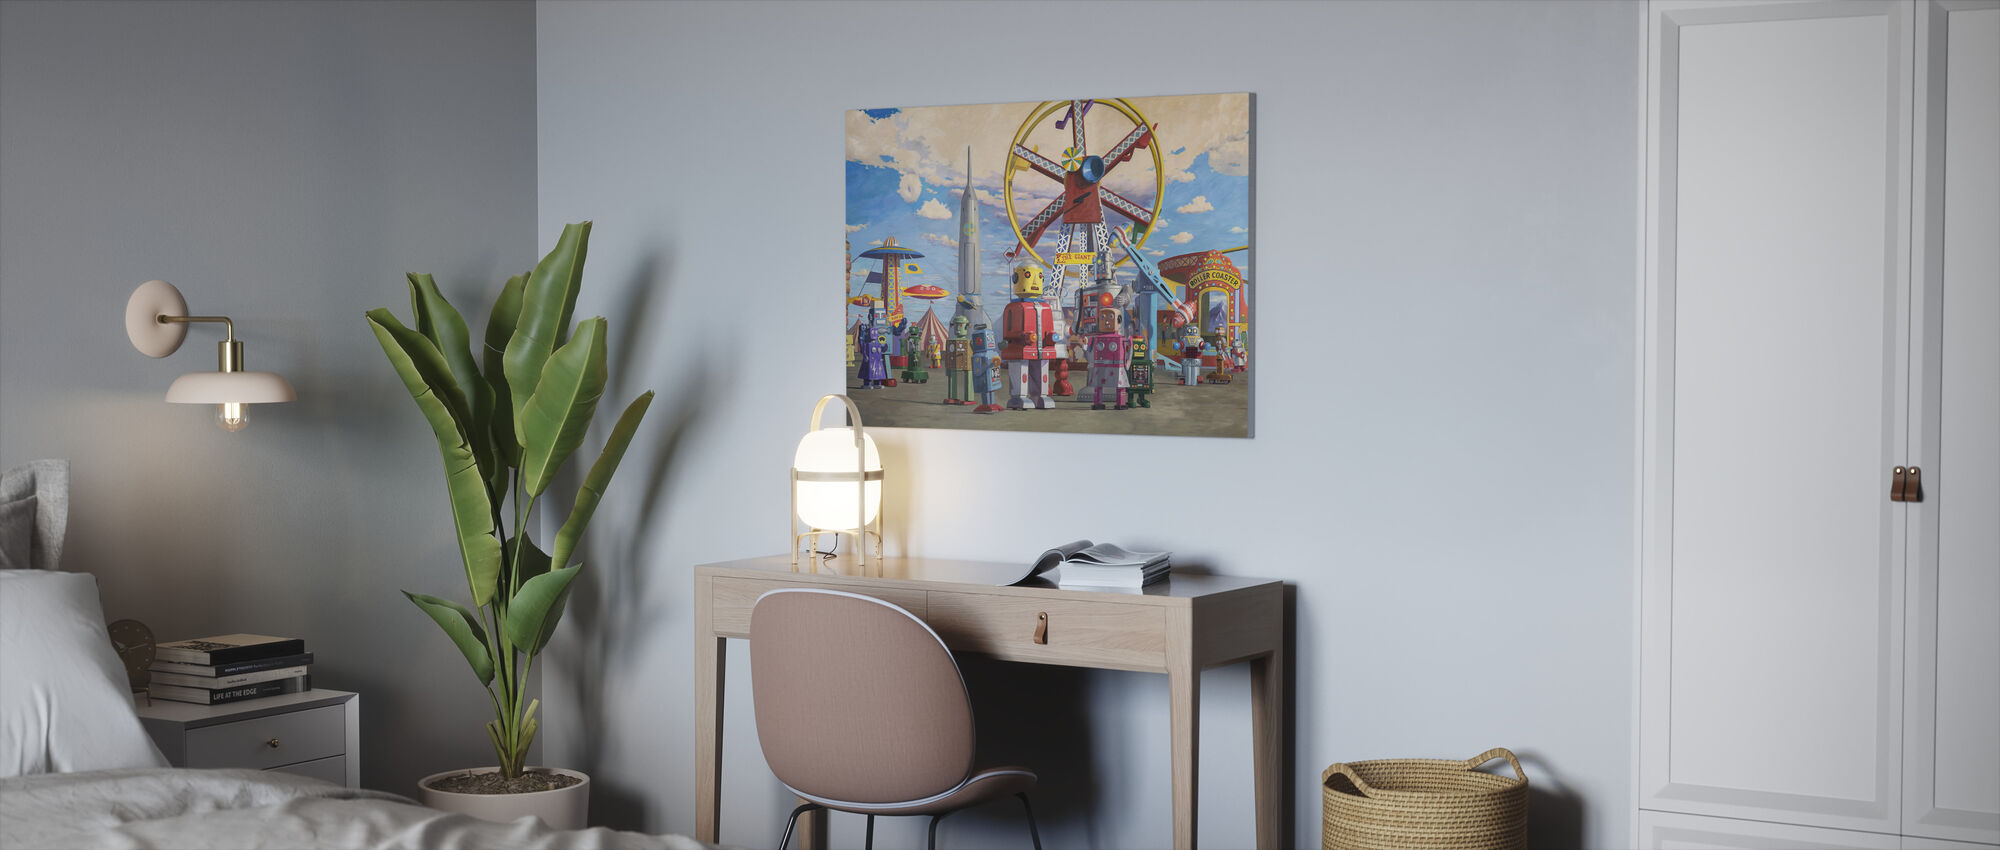 Fairgrounds - Canvas print - Office